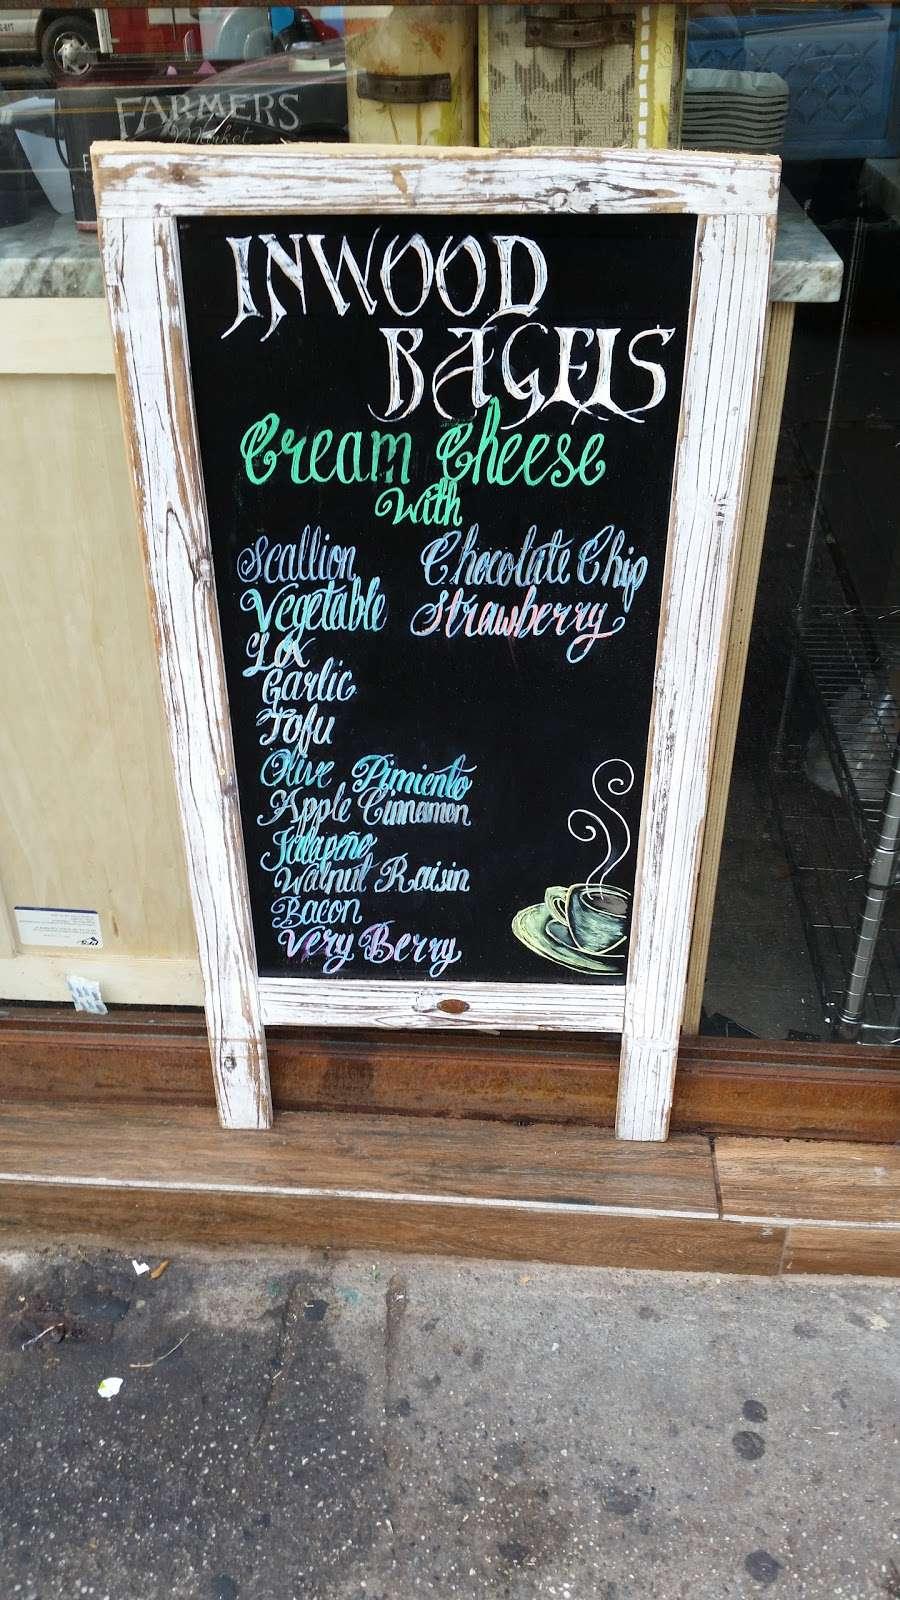 Inwood Bagels - bakery  | Photo 8 of 9 | Address: 628 W 207th St, New York, NY 10034, USA | Phone: (212) 569-7770